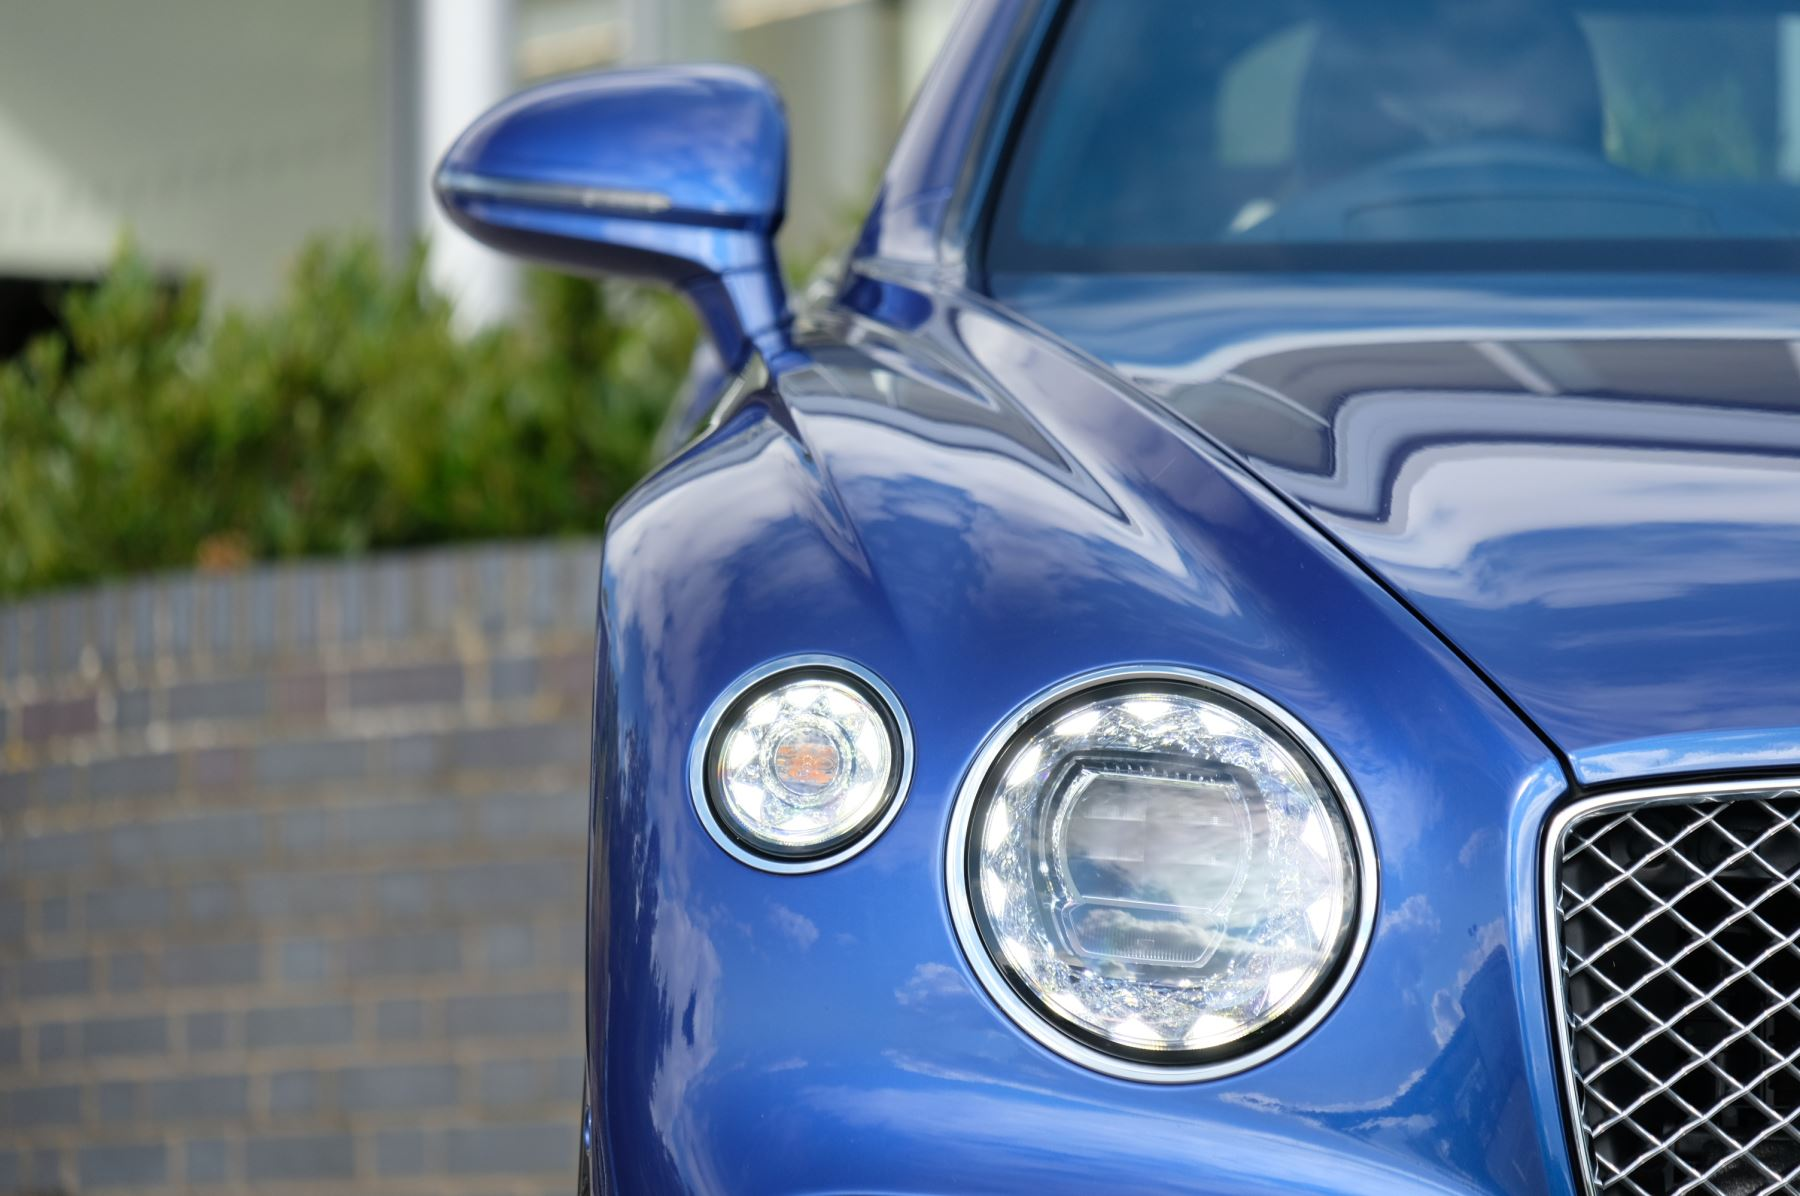 Bentley Continental GT 4.0 V8 2dr Mulliner Driving Specification image 6